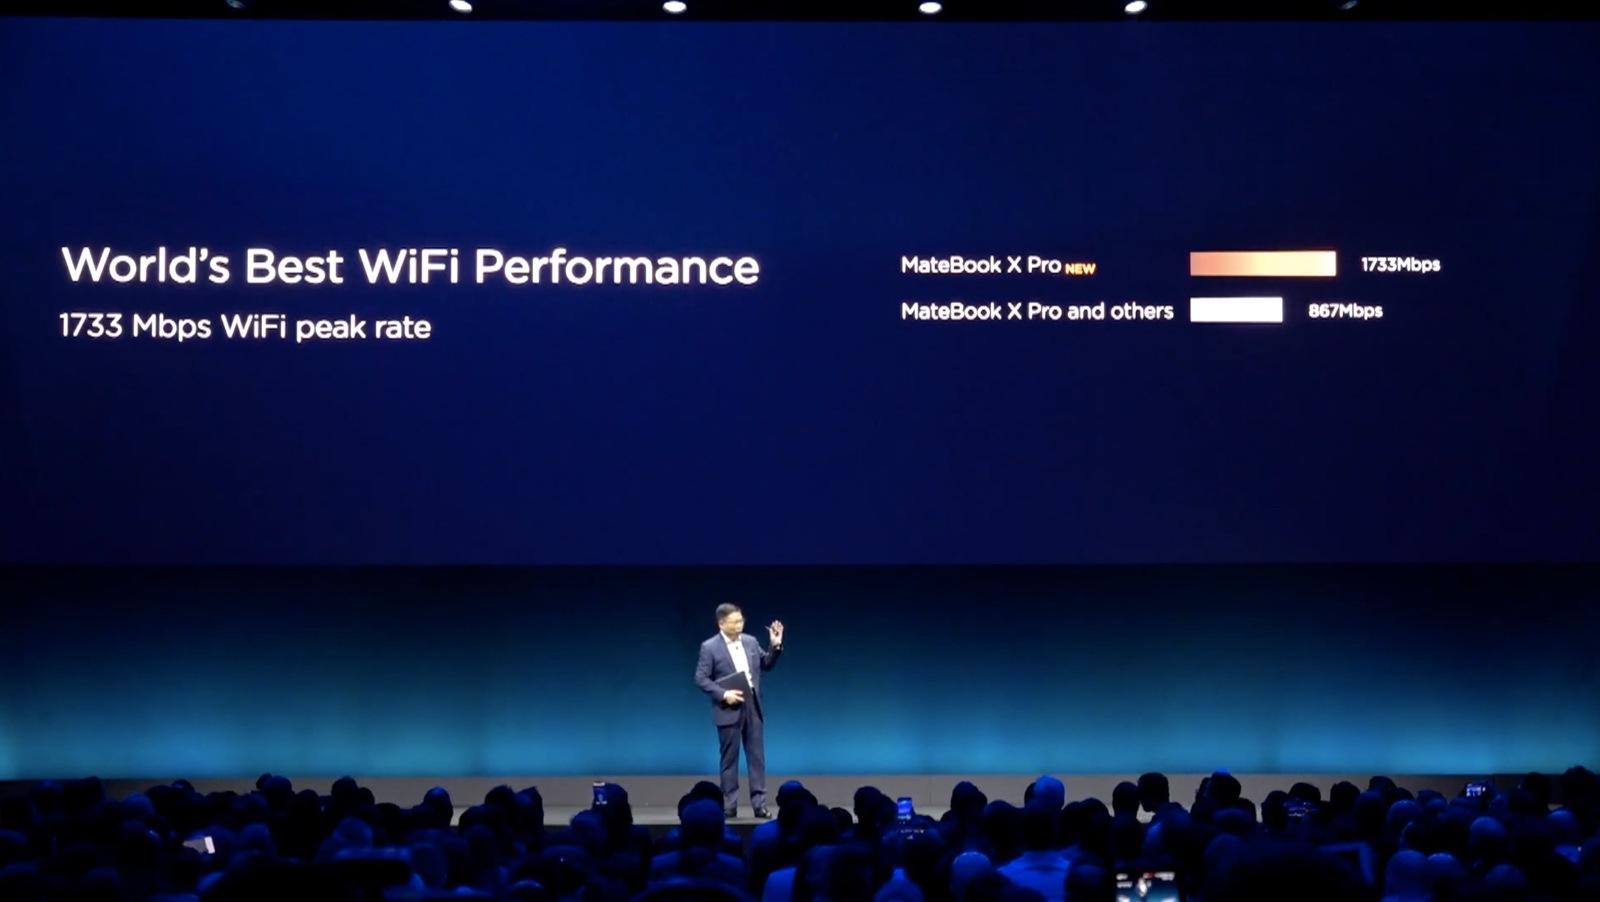 Huawei-MateBook-X-Pro-06.jpg